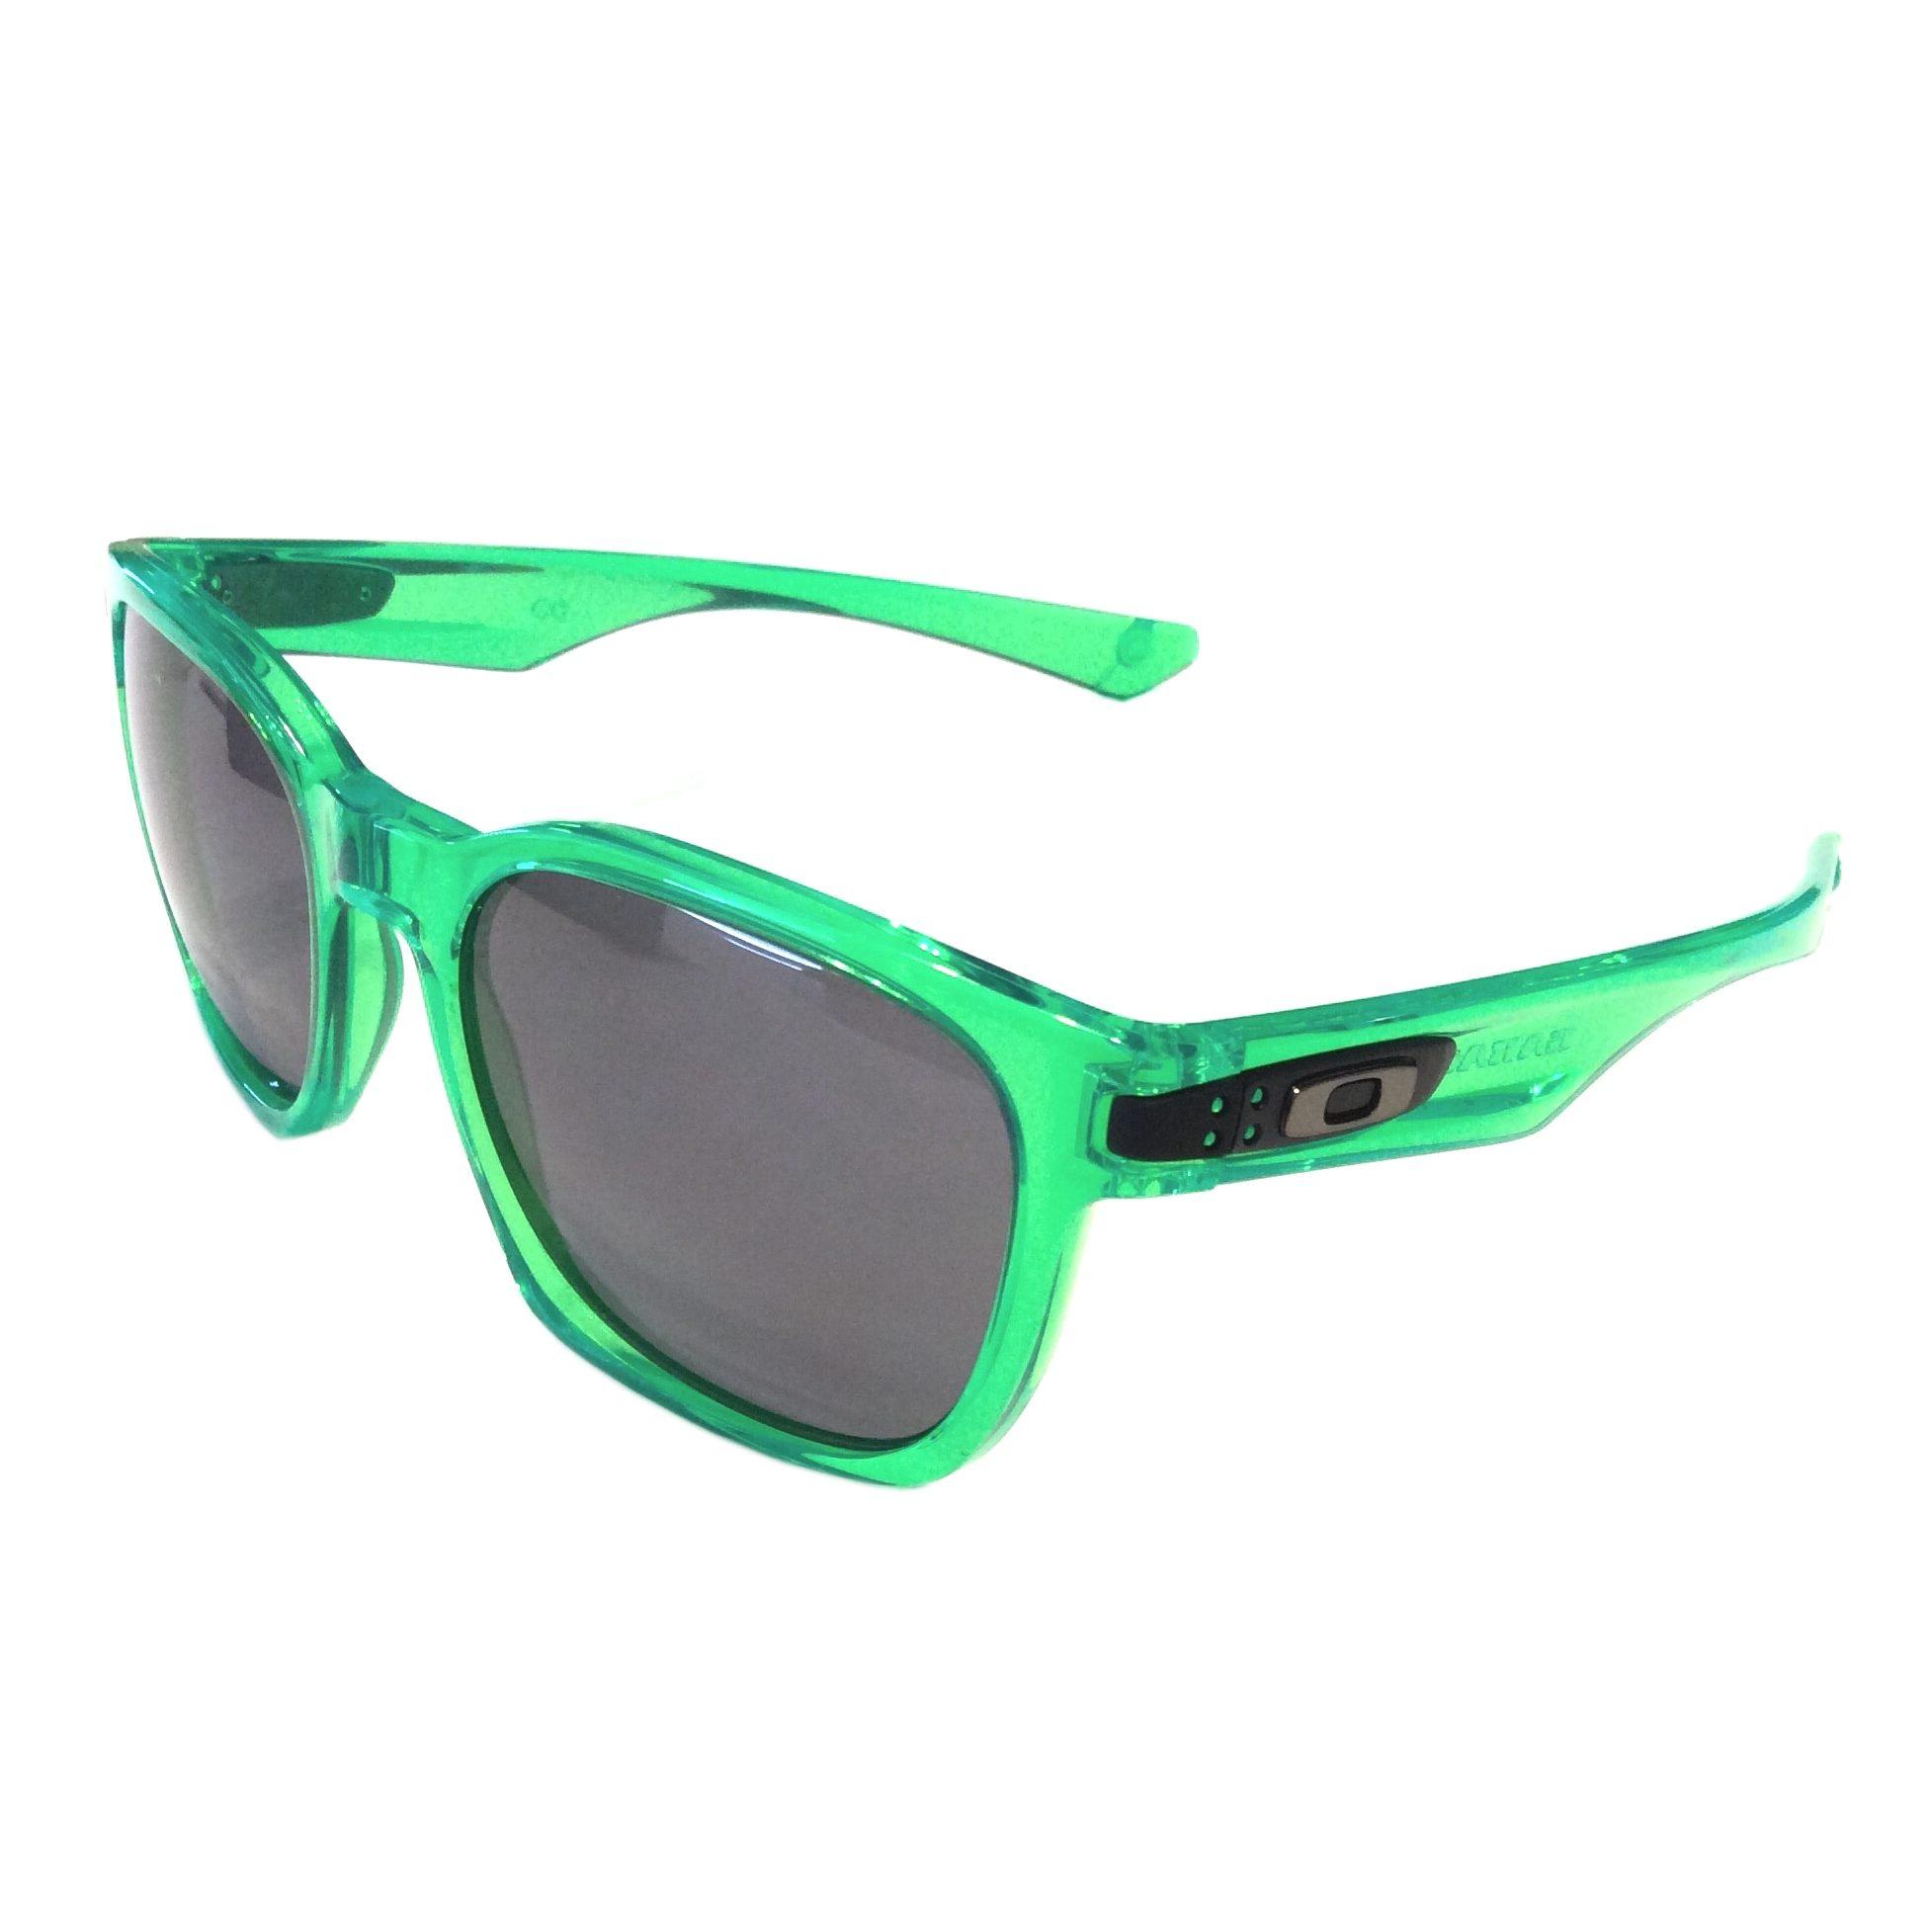 oakley sunglasses green nqcz  Oakley Garage Rock MPH Sunglasses  Anti Freeze Green Frame  Gray Lens   OO9175-38